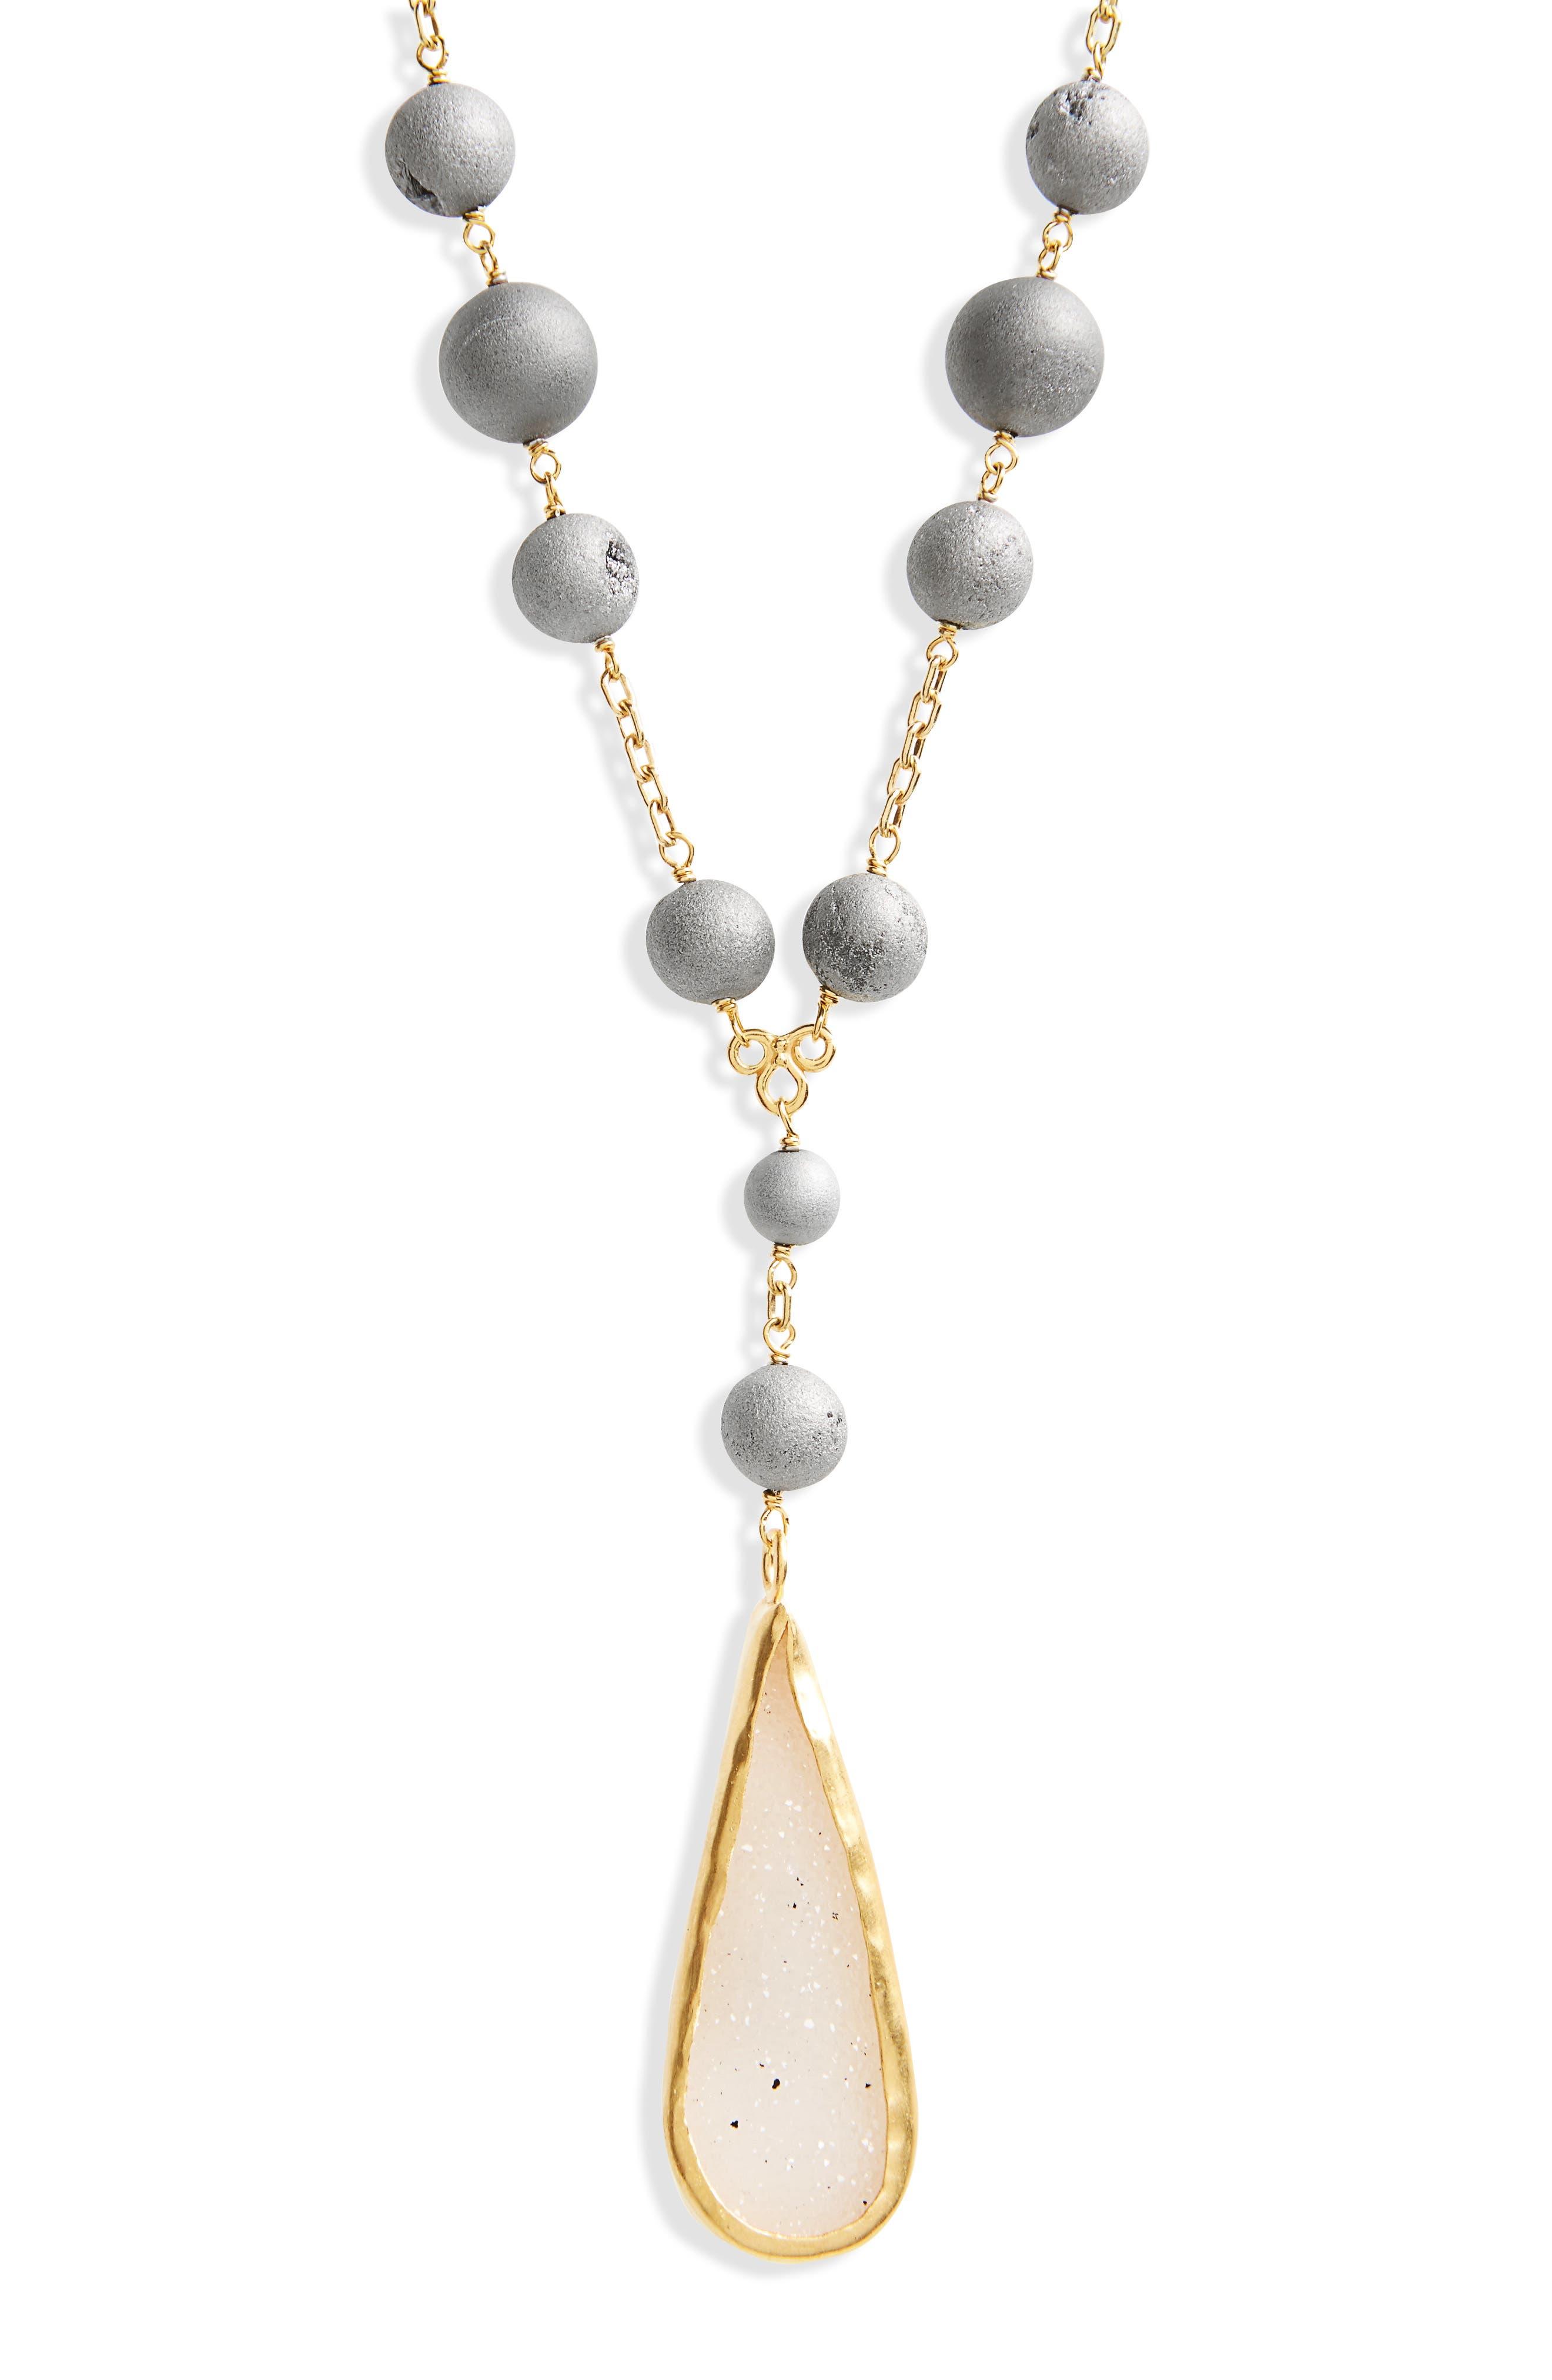 Drusy Agate Pendant Necklace,                             Alternate thumbnail 2, color,                             040